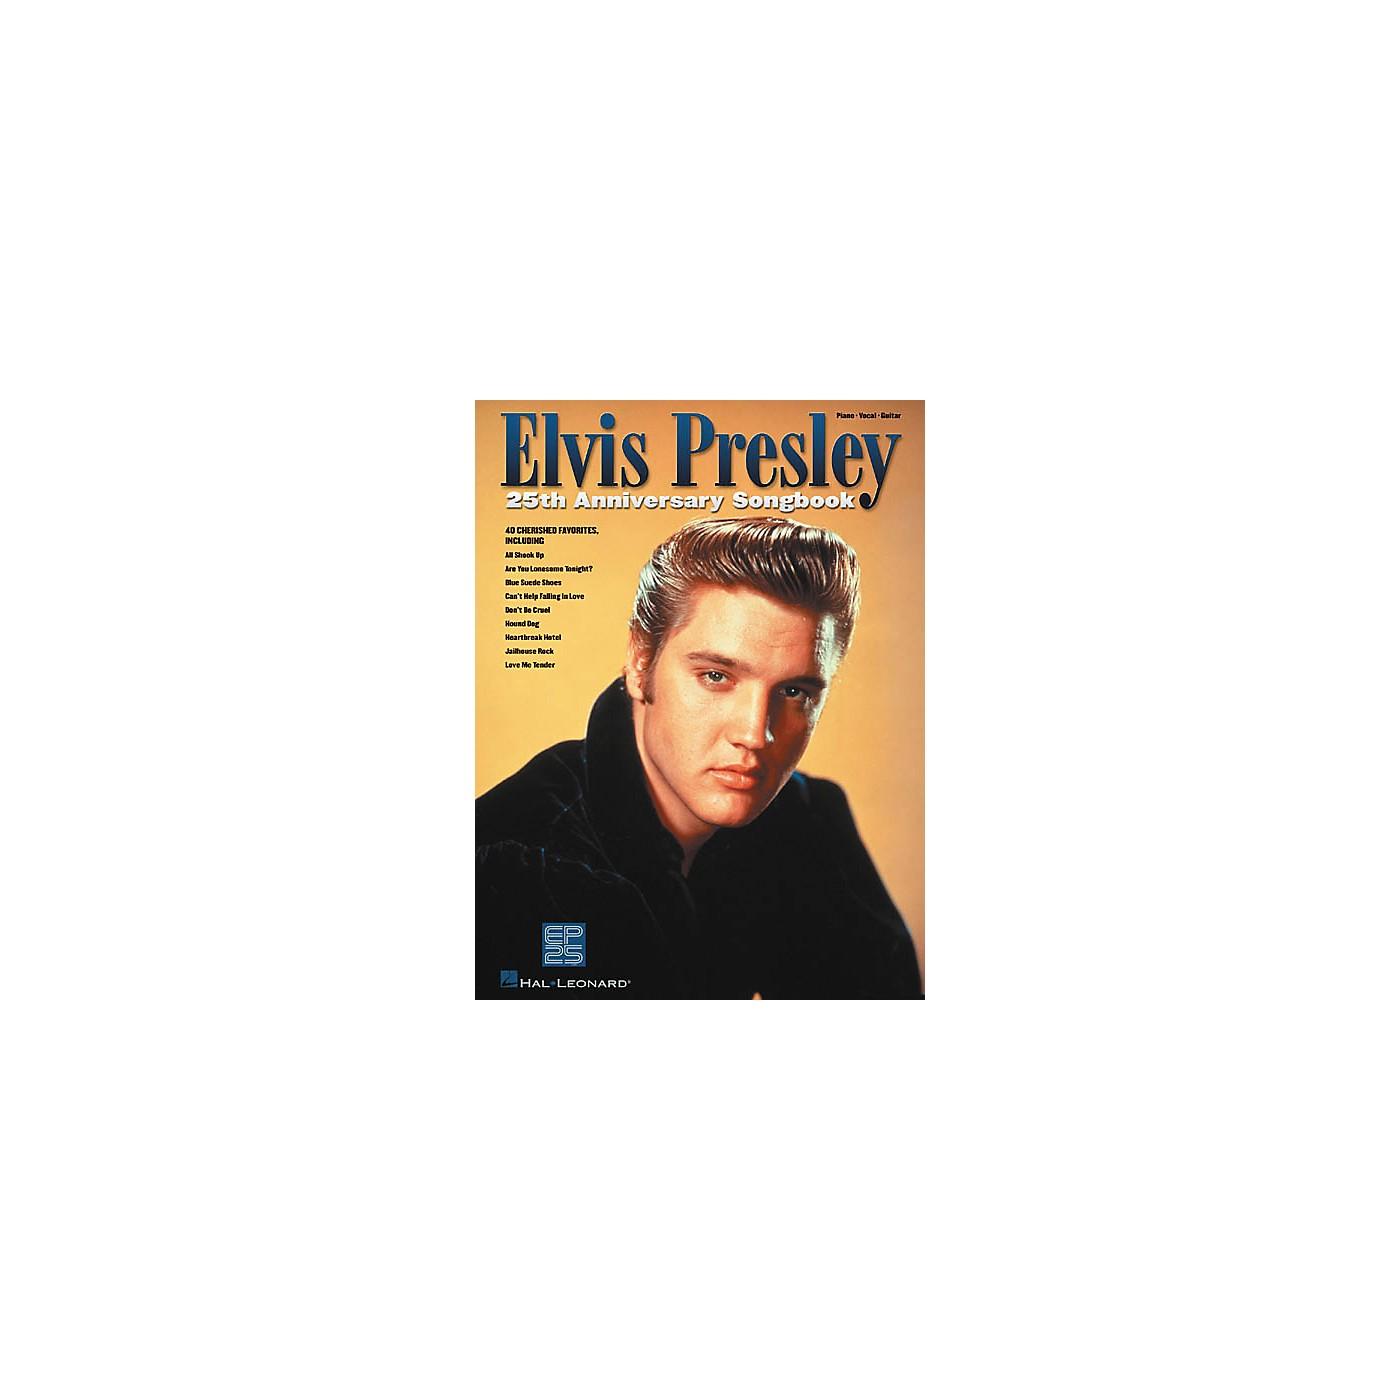 Hal Leonard Elvis Presley 25th Anniversary Piano, Vocal, Guitar Songbook thumbnail